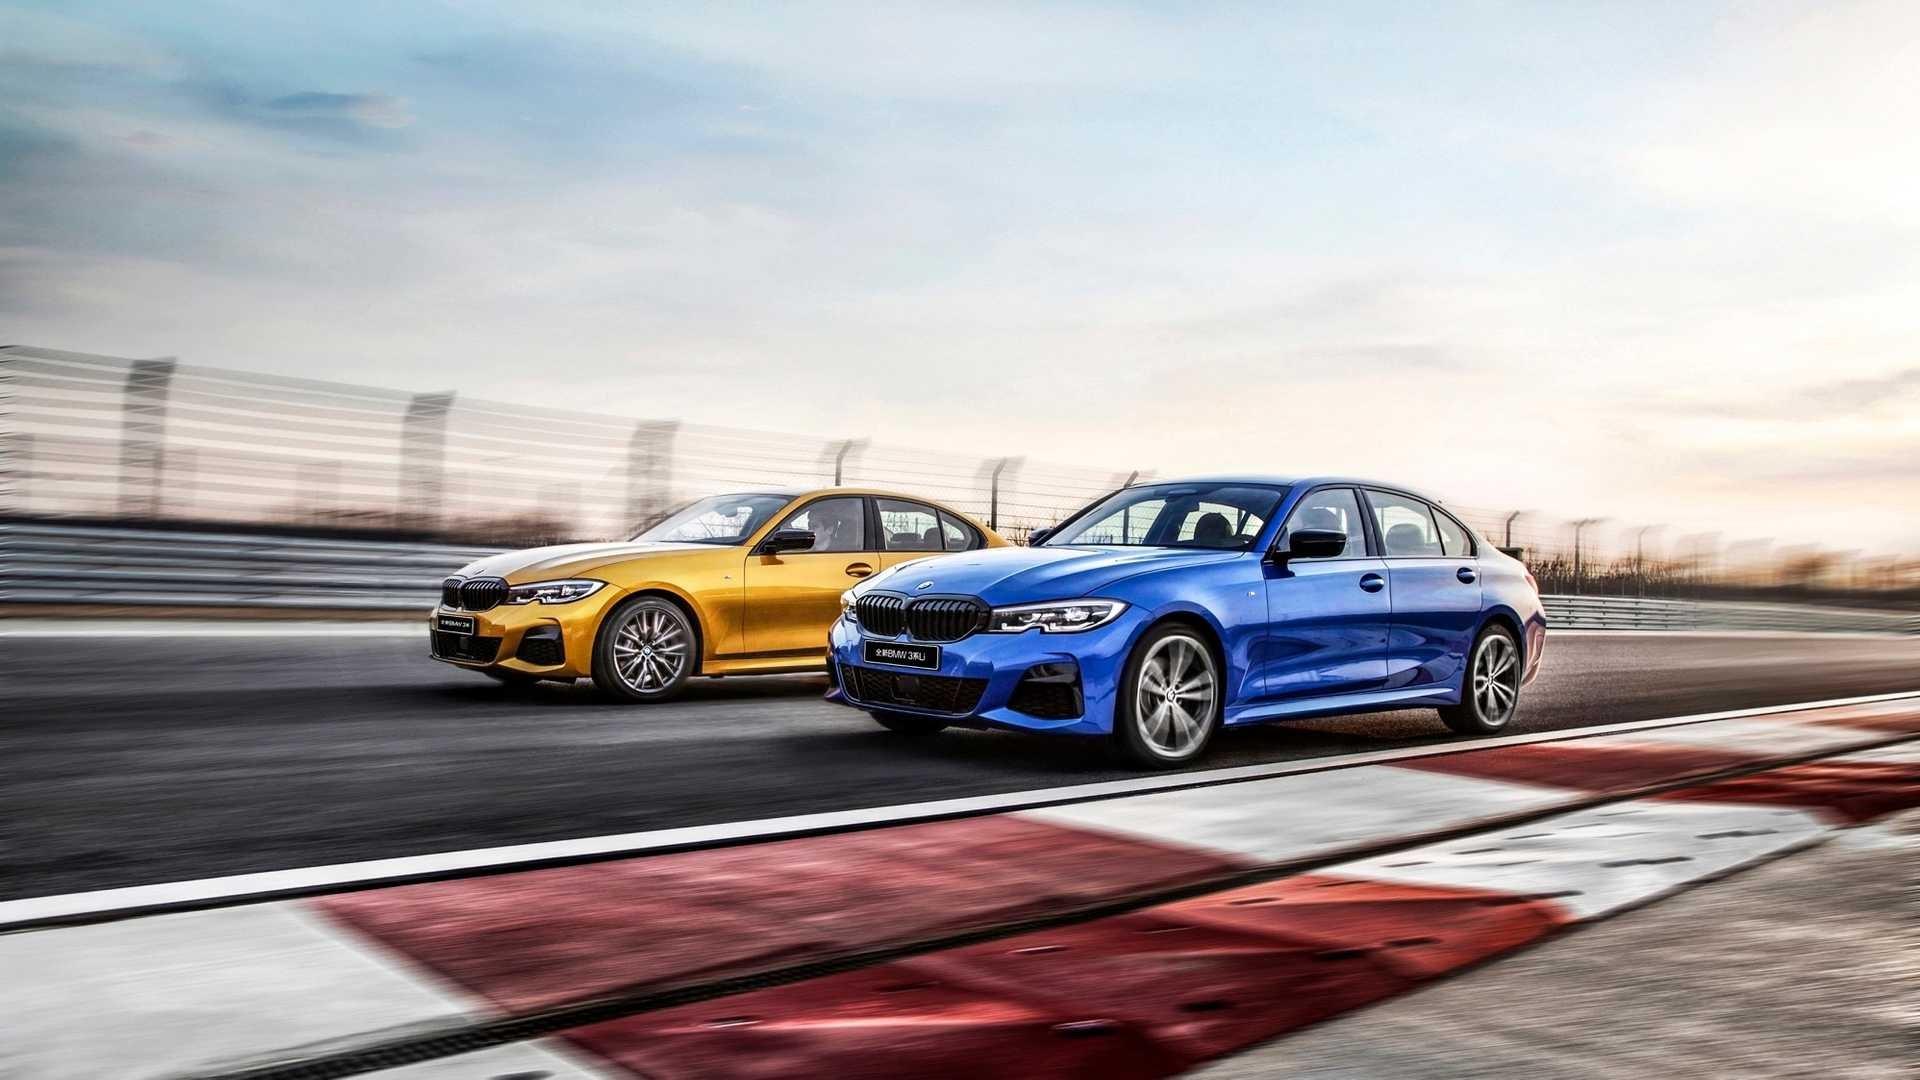 BMW-3-Series-LWB-Long-Wheelbase-2019-6